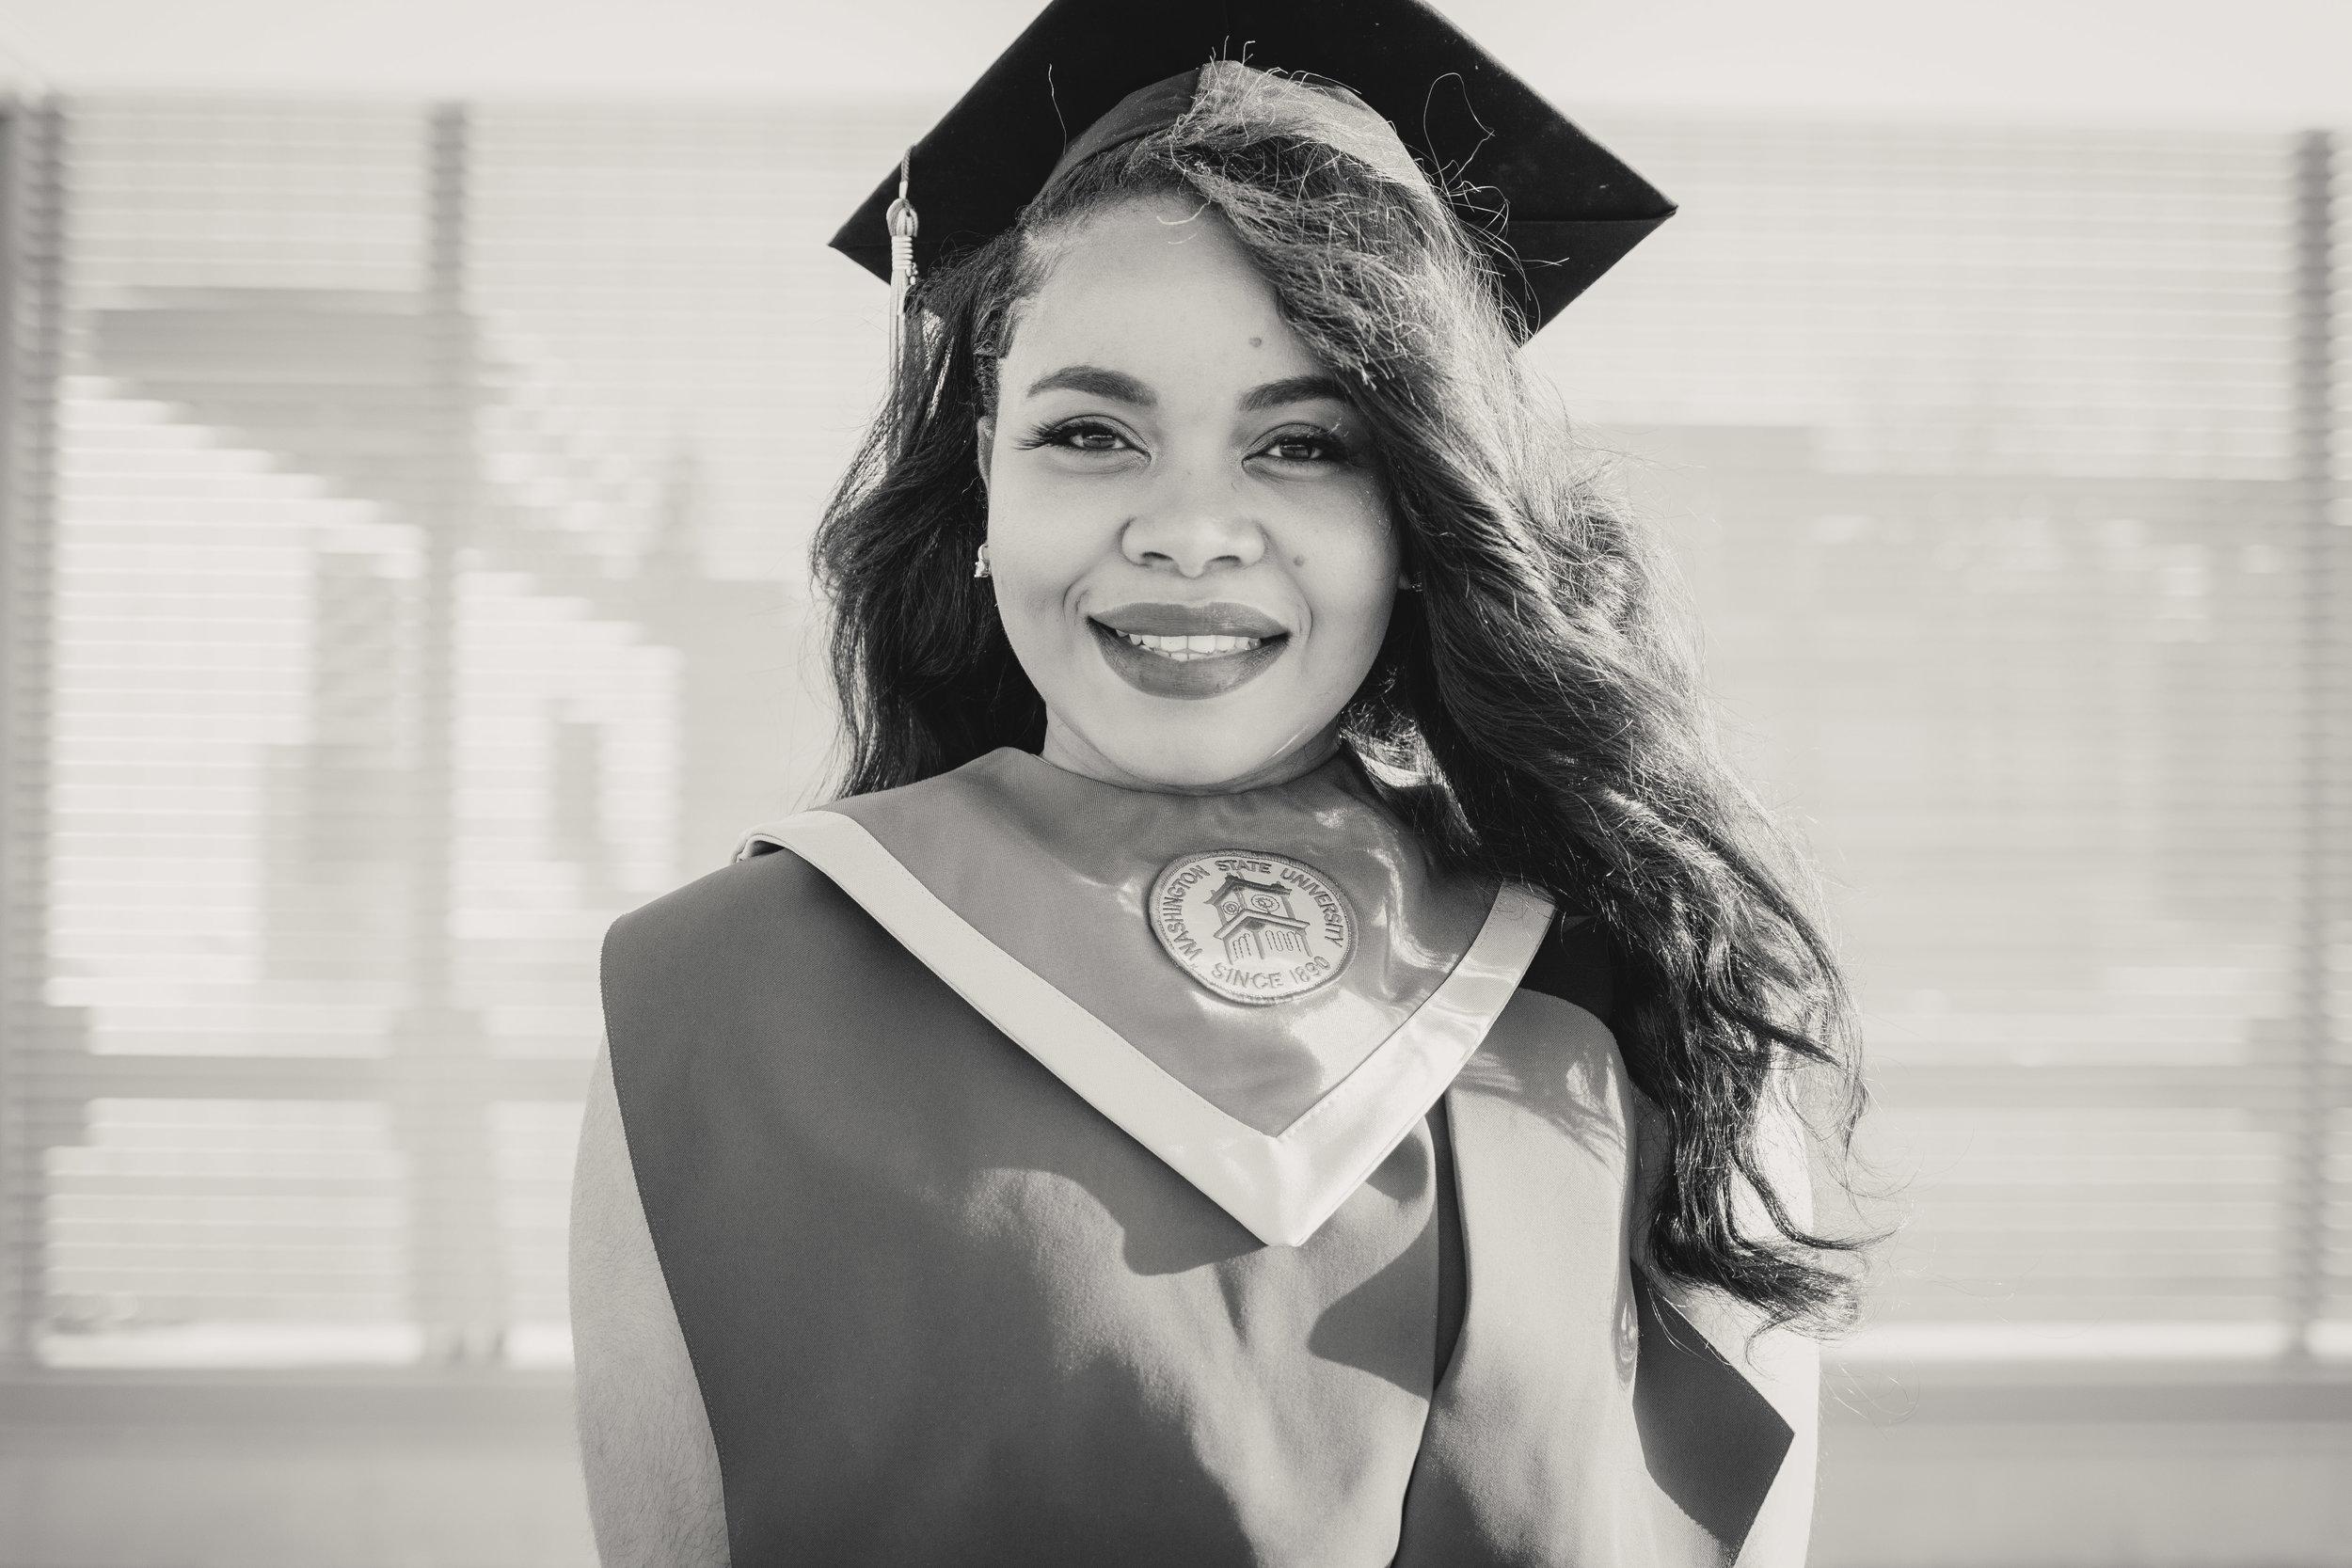 Ana_graduation-46.jpg